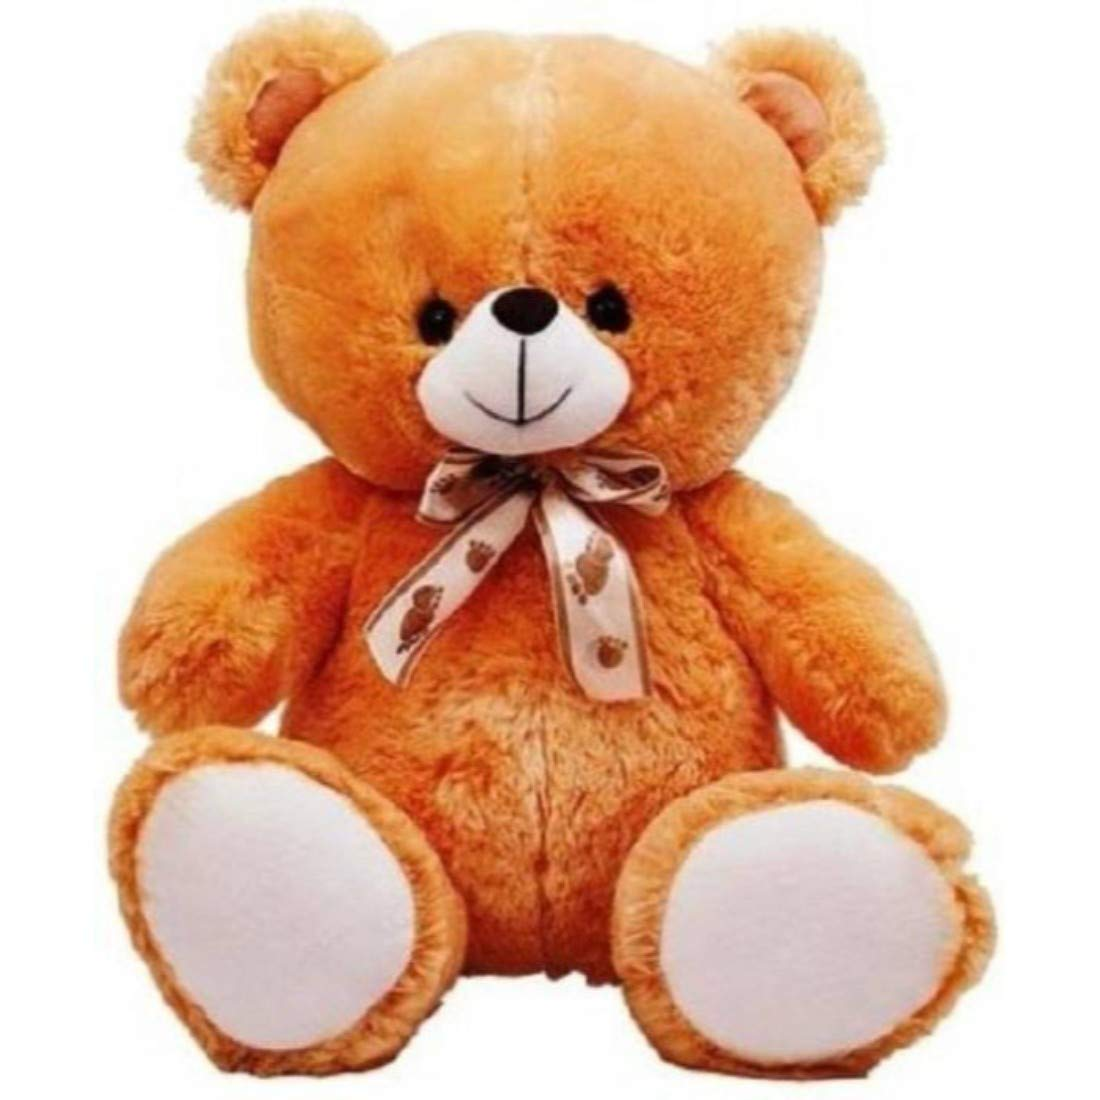 Buttercup Soft Toys Extra Small Very Soft Lovable/Huggable Teddy Bear for Girlfriend/Birthday Gift/Boy/Girl - 2 Feet (60 cm, Dark Brown) (B07VLSDLQH) Amazon Price History, Amazon Price Tracker